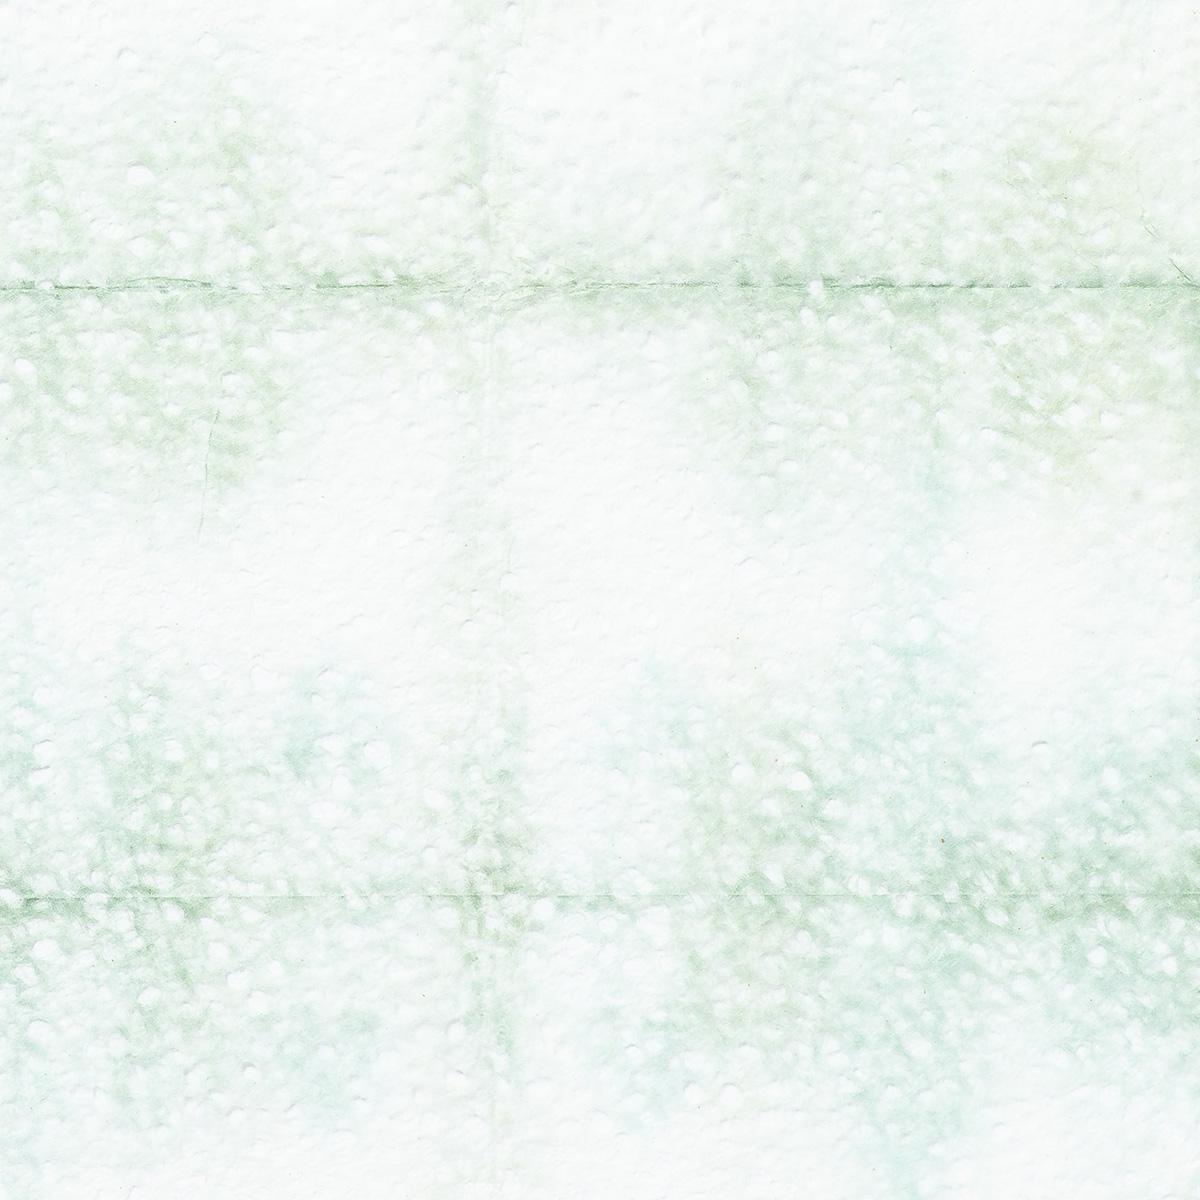 落水紙(春雨)板締め No.20